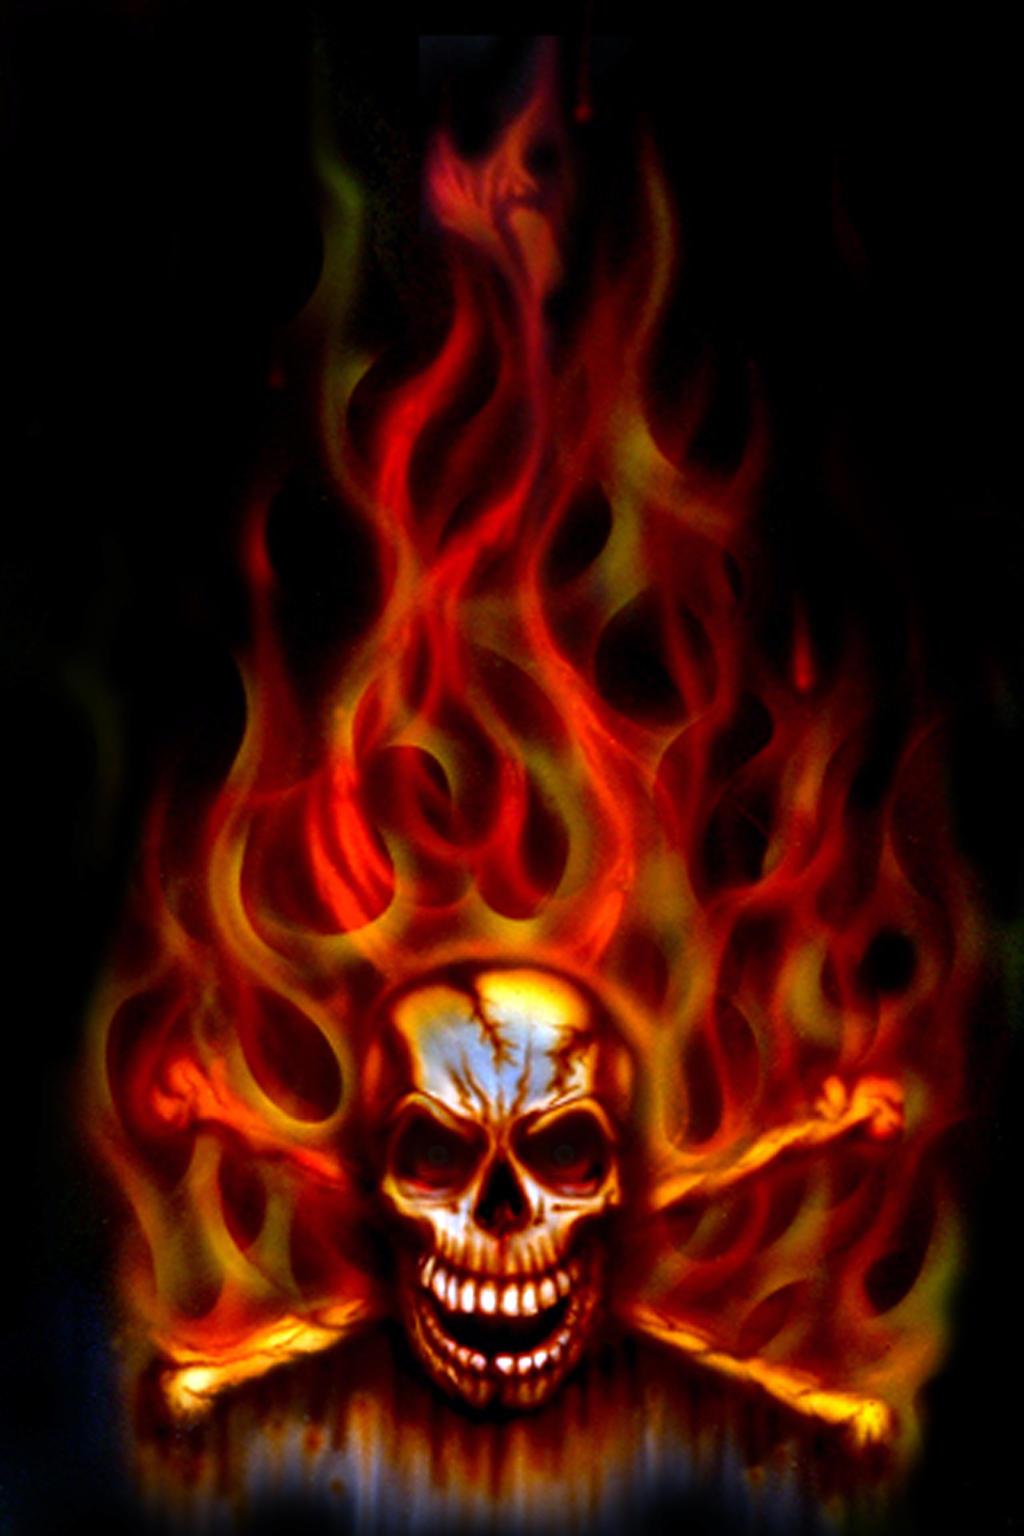 Skull fire updated by hardart kustoms on deviantart skull fire updated by hardart kustoms voltagebd Choice Image